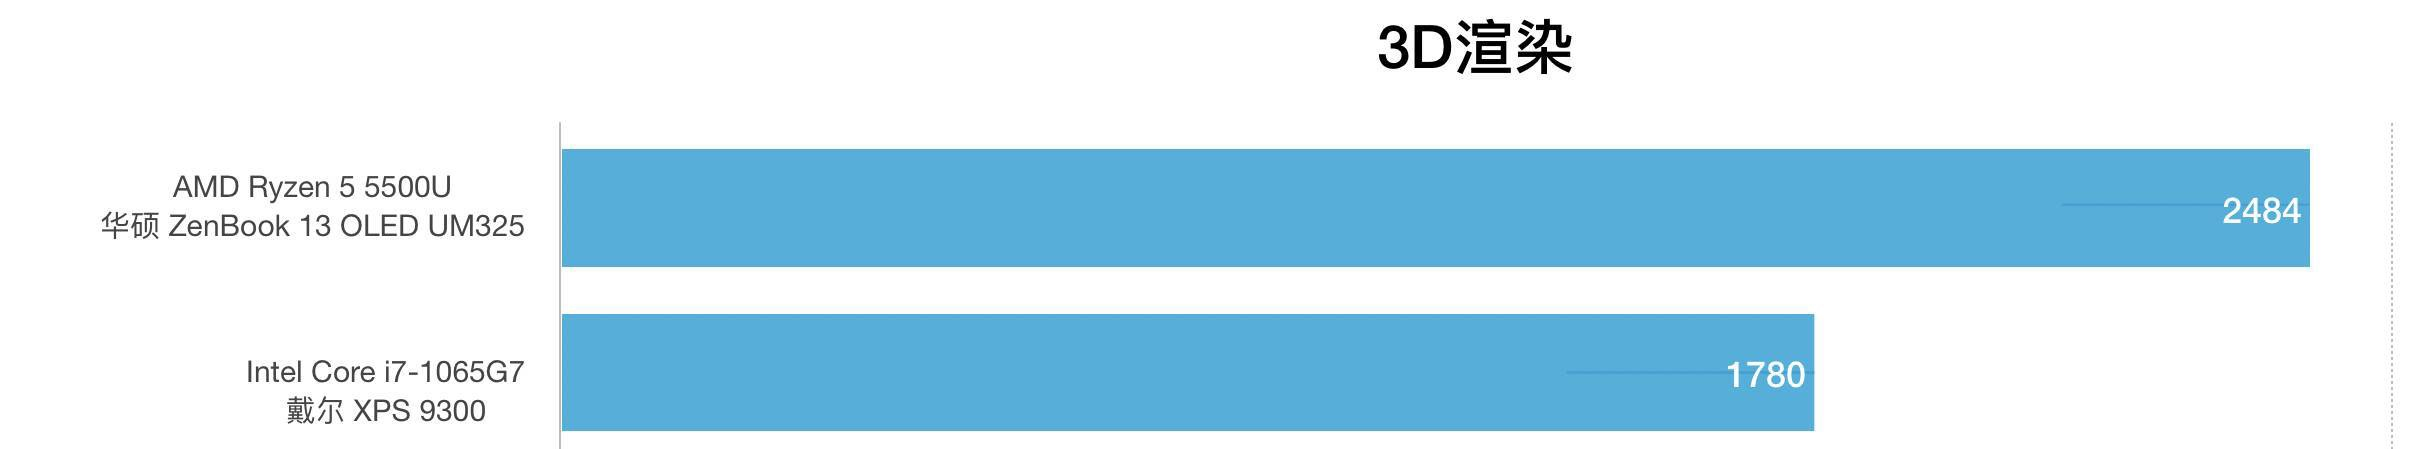 AMD锐龙R5 5500U和i7-1065G7性能跑分对比评测